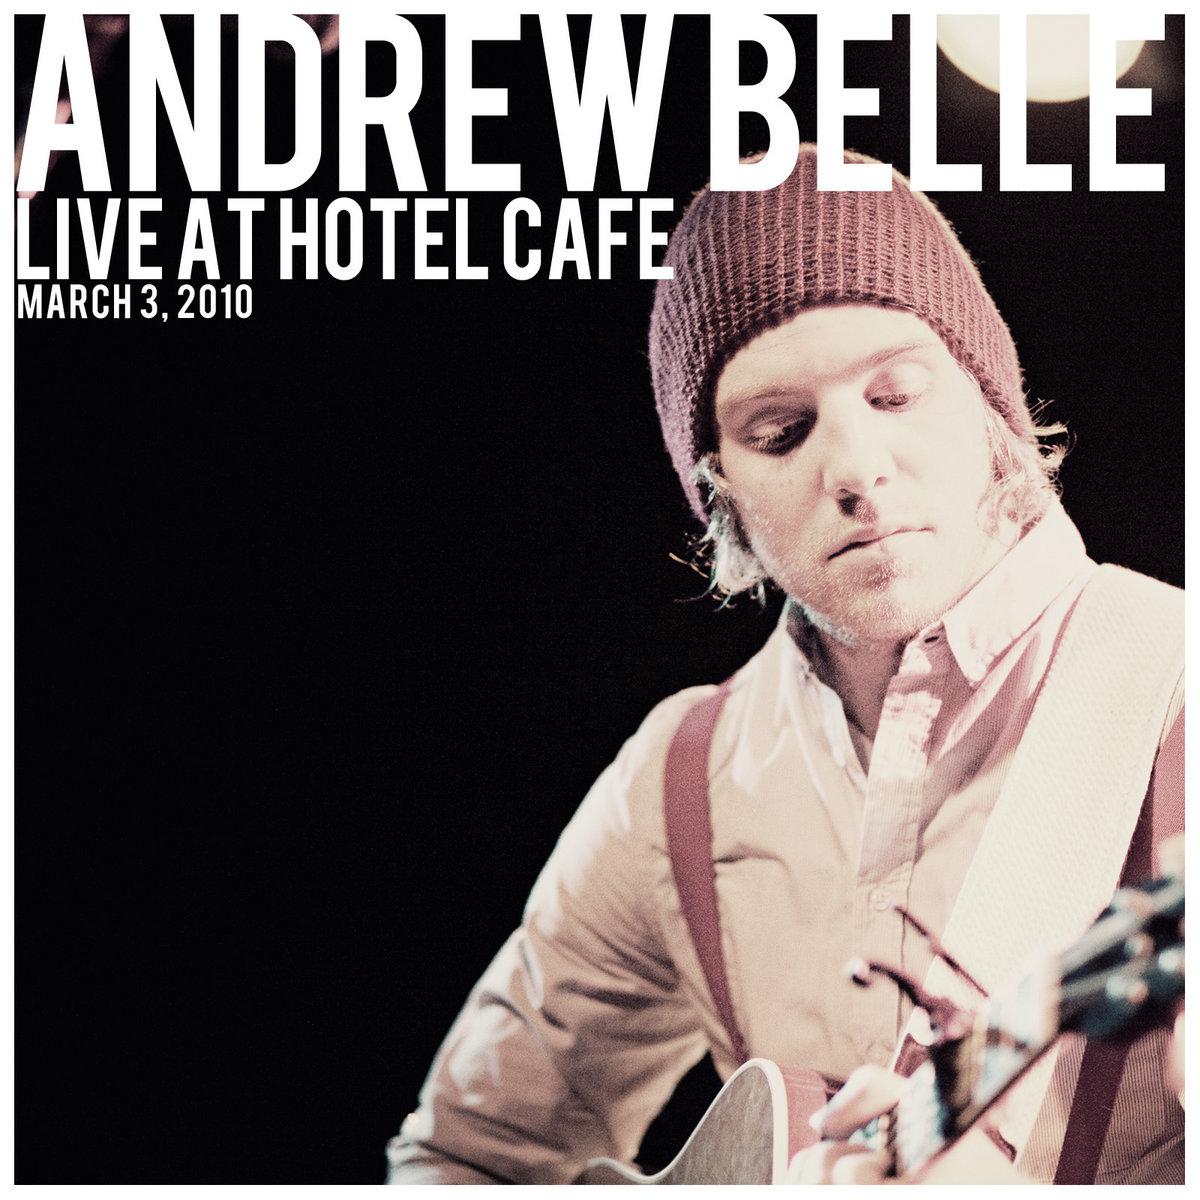 Mp3skull – Andrew Belle In My Veins Mp3 Download In Mp3 Skull